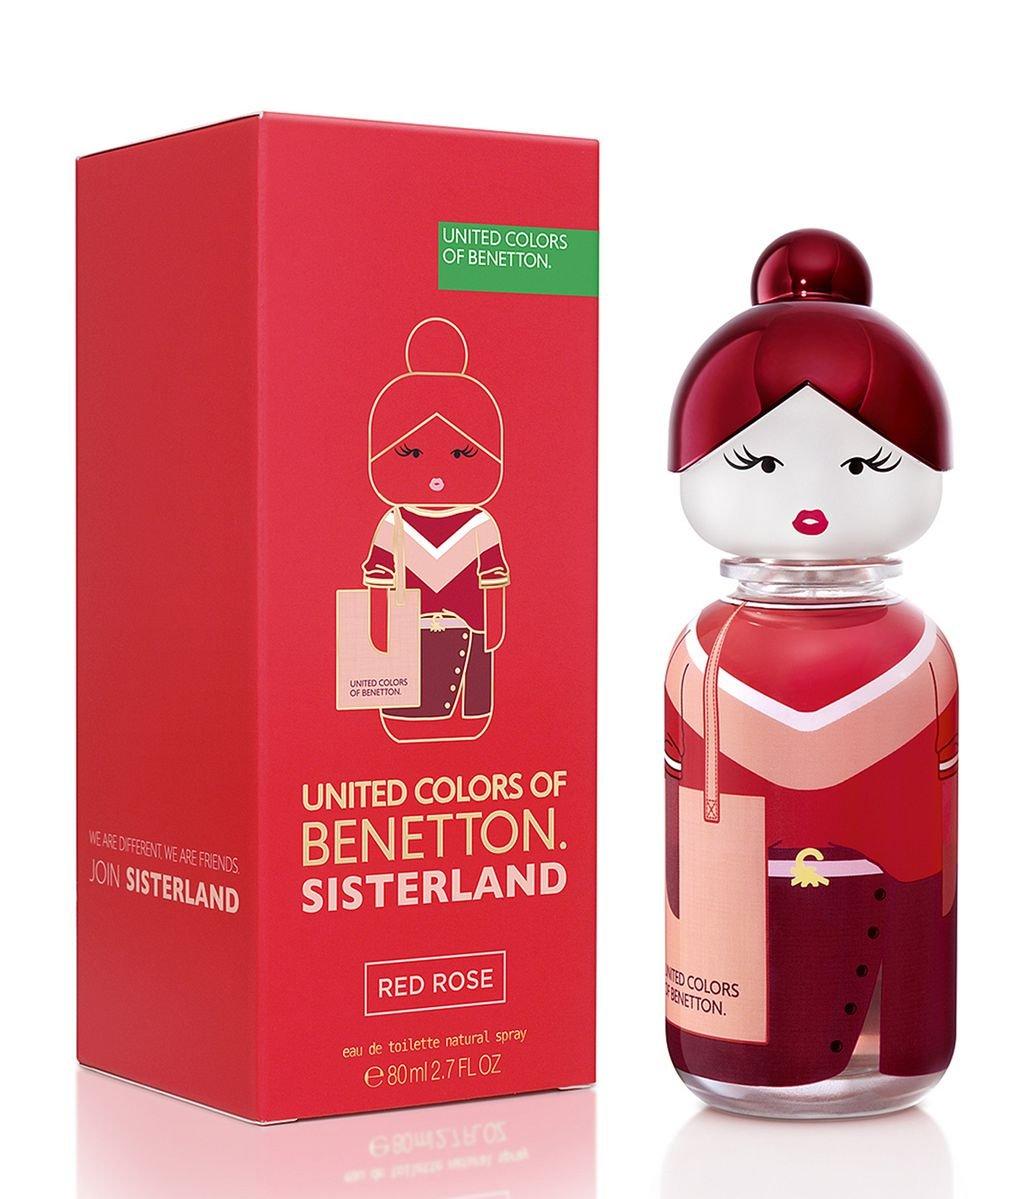 Perfume Sisterland Red Rose Benetton Eau de Toilette 80ml